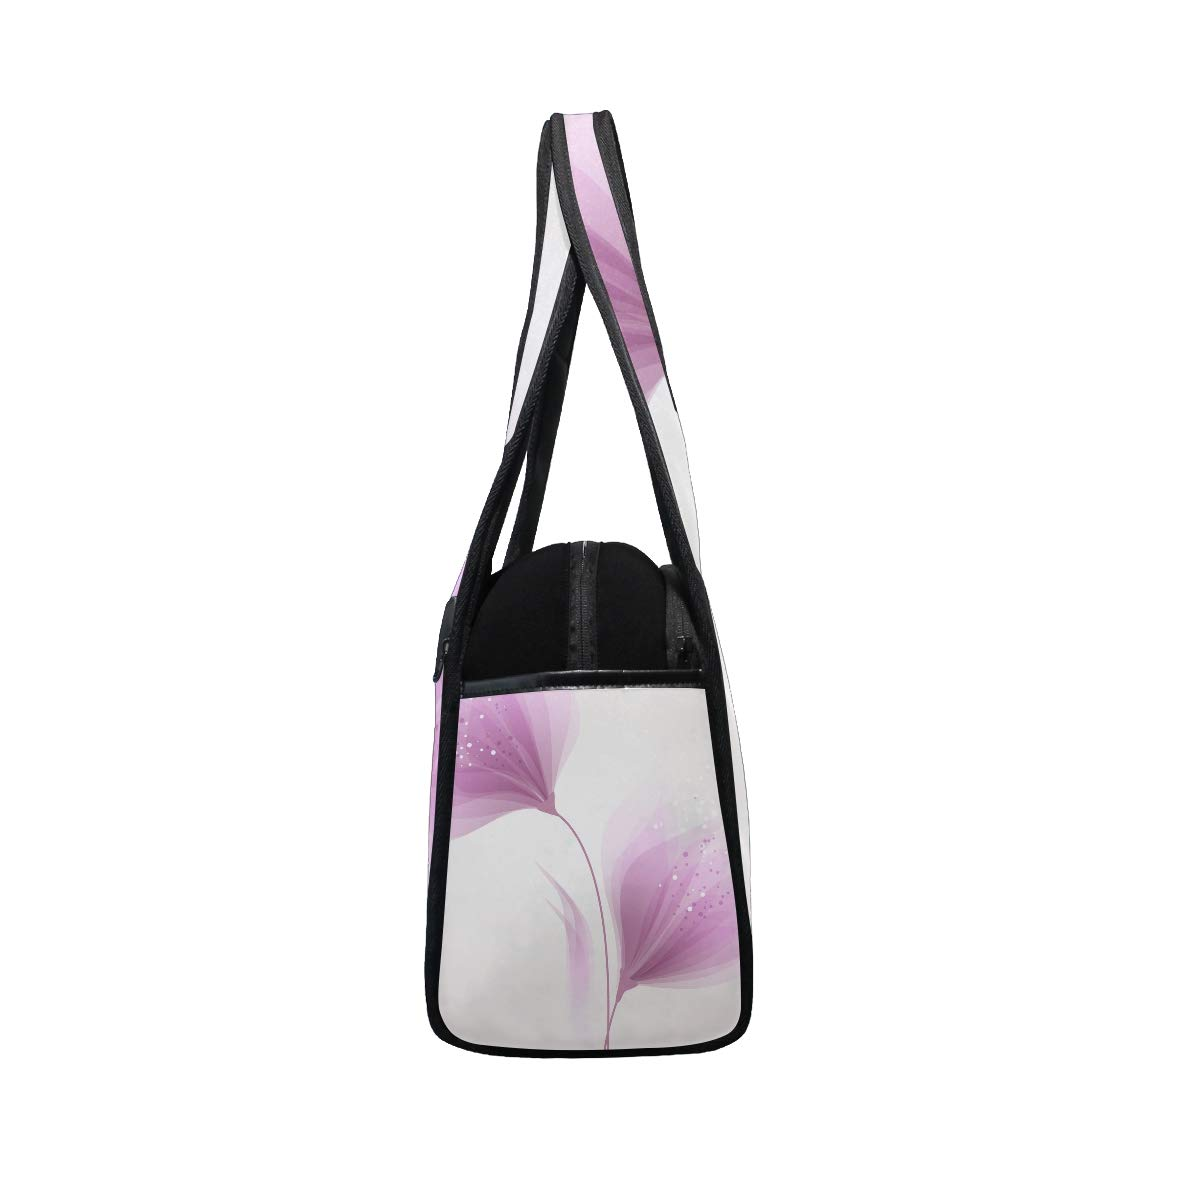 Abstract Bloom Pink Flower Women Sports Gym Totes Bag Multi-Function Nylon Travel Shoulder Bag